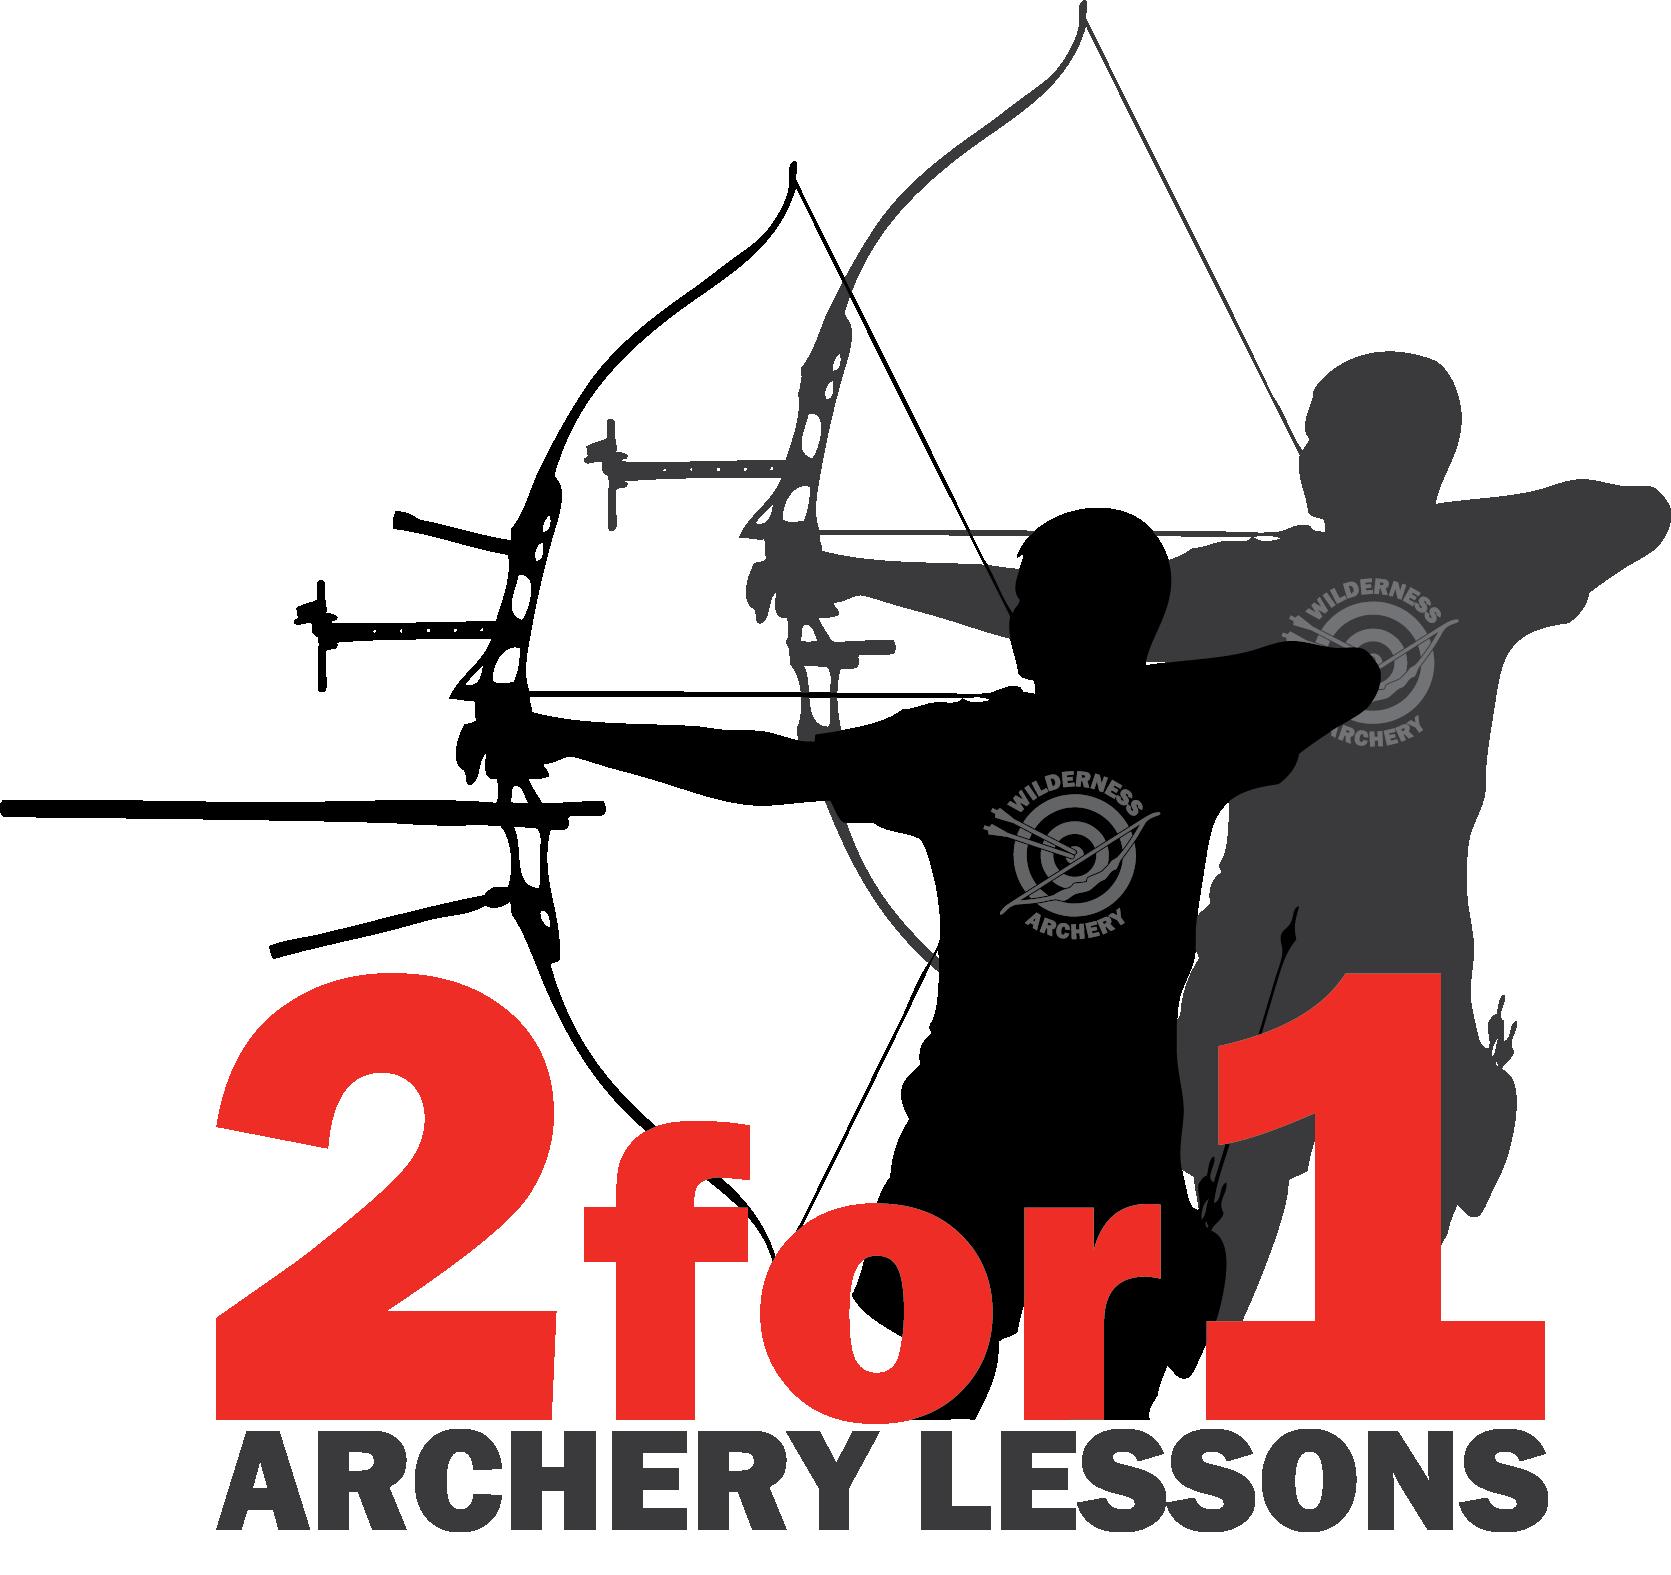 Archery clipart archery range. Family friends class wilderness